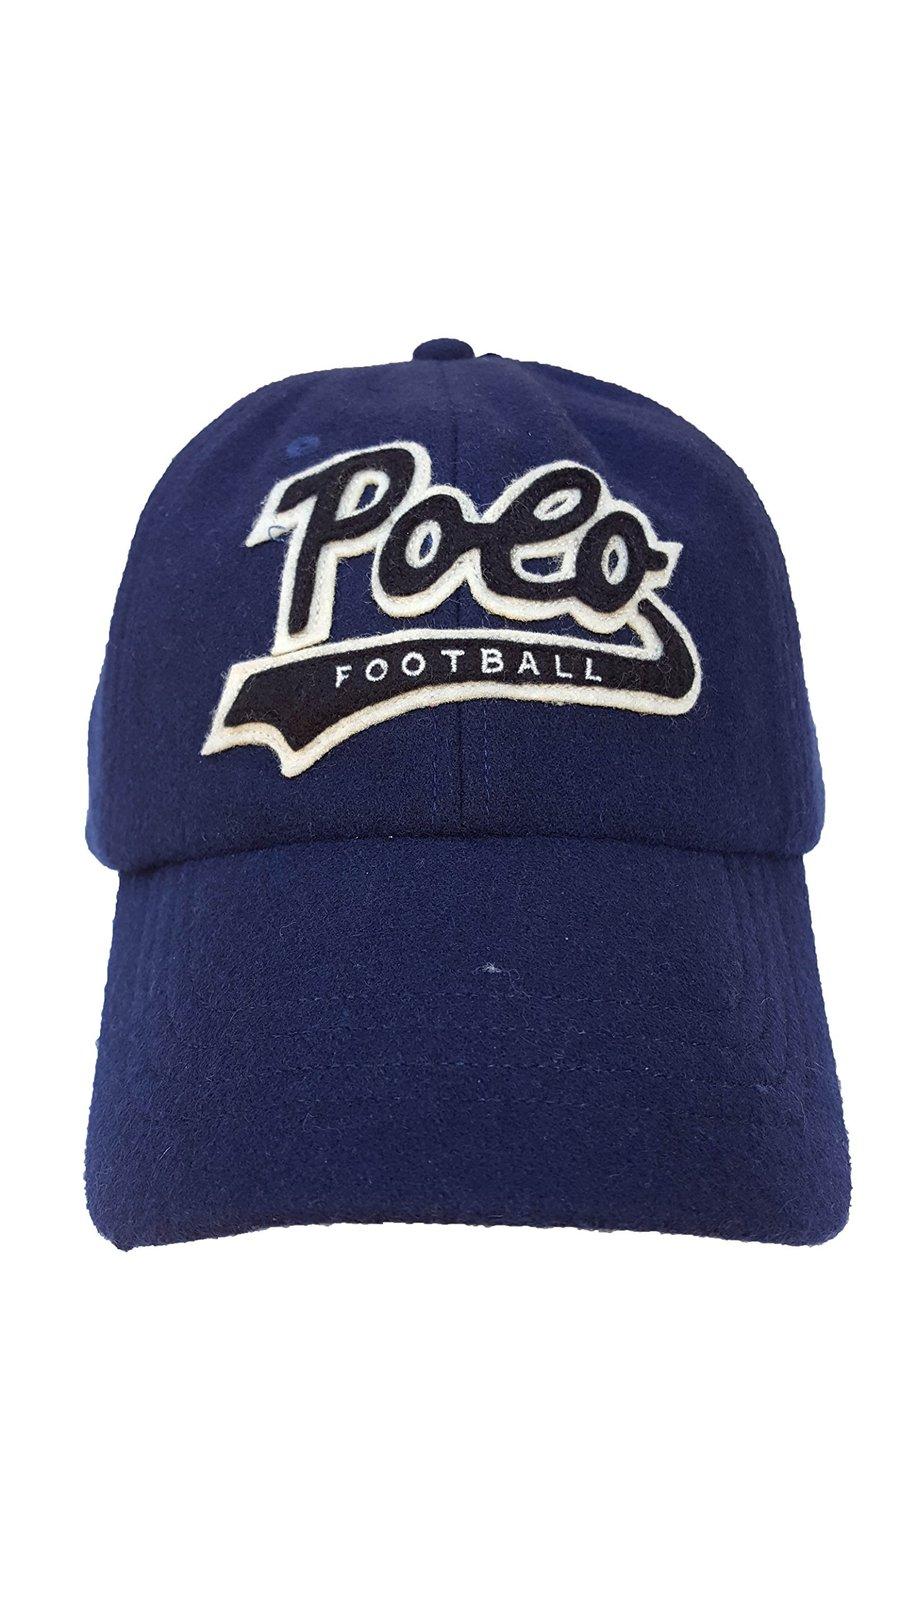 c60983214 Polo Ralph Lauren Mens Wool - Blend Football and 50 similar items